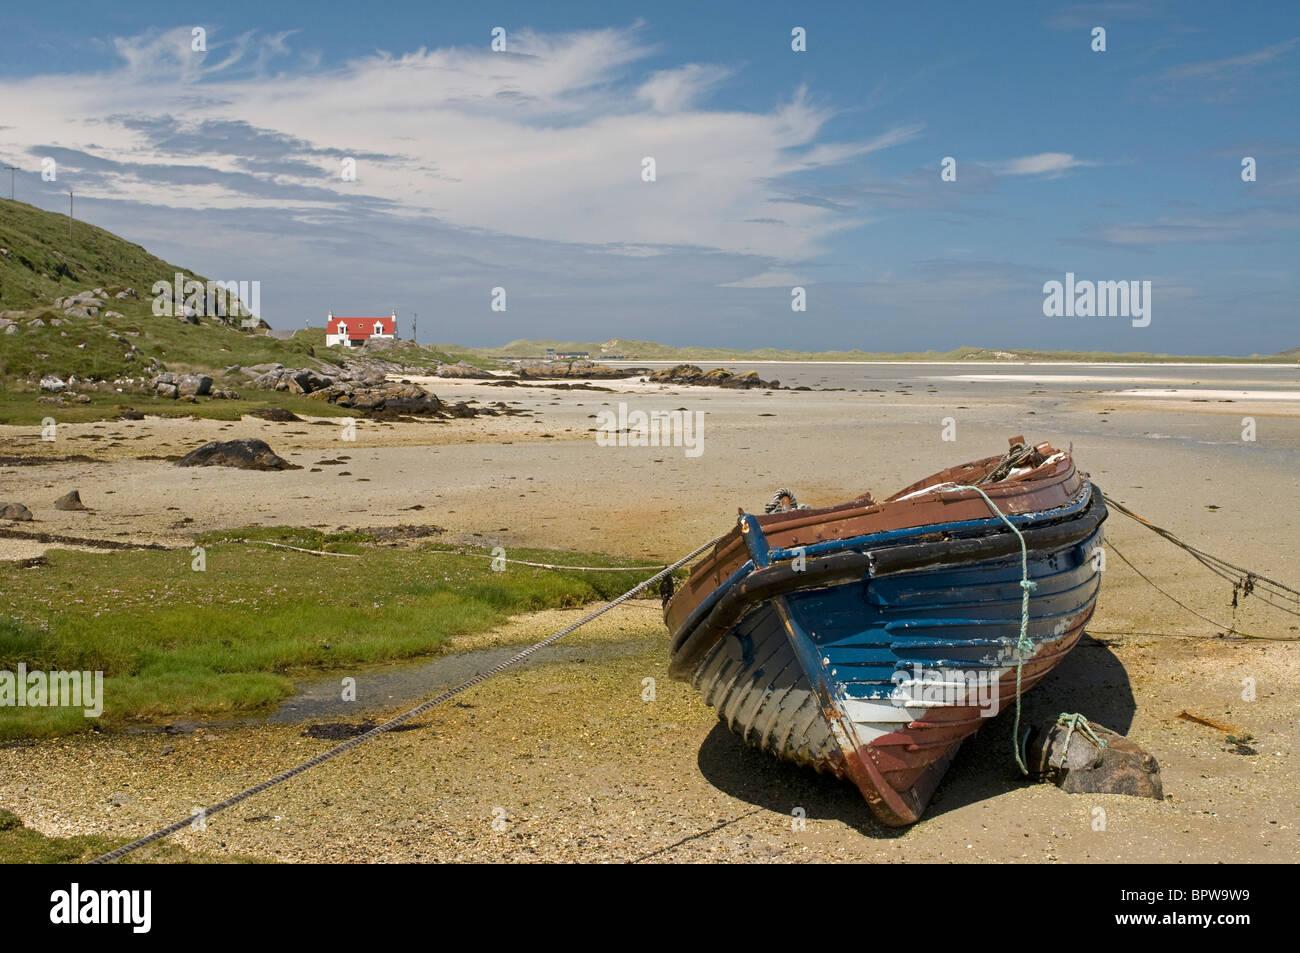 Crannag at Traig Mhor beach Isle of Barra, Outer Hebrides Western Isles. Scotland.  SCO 6543 - Stock Image